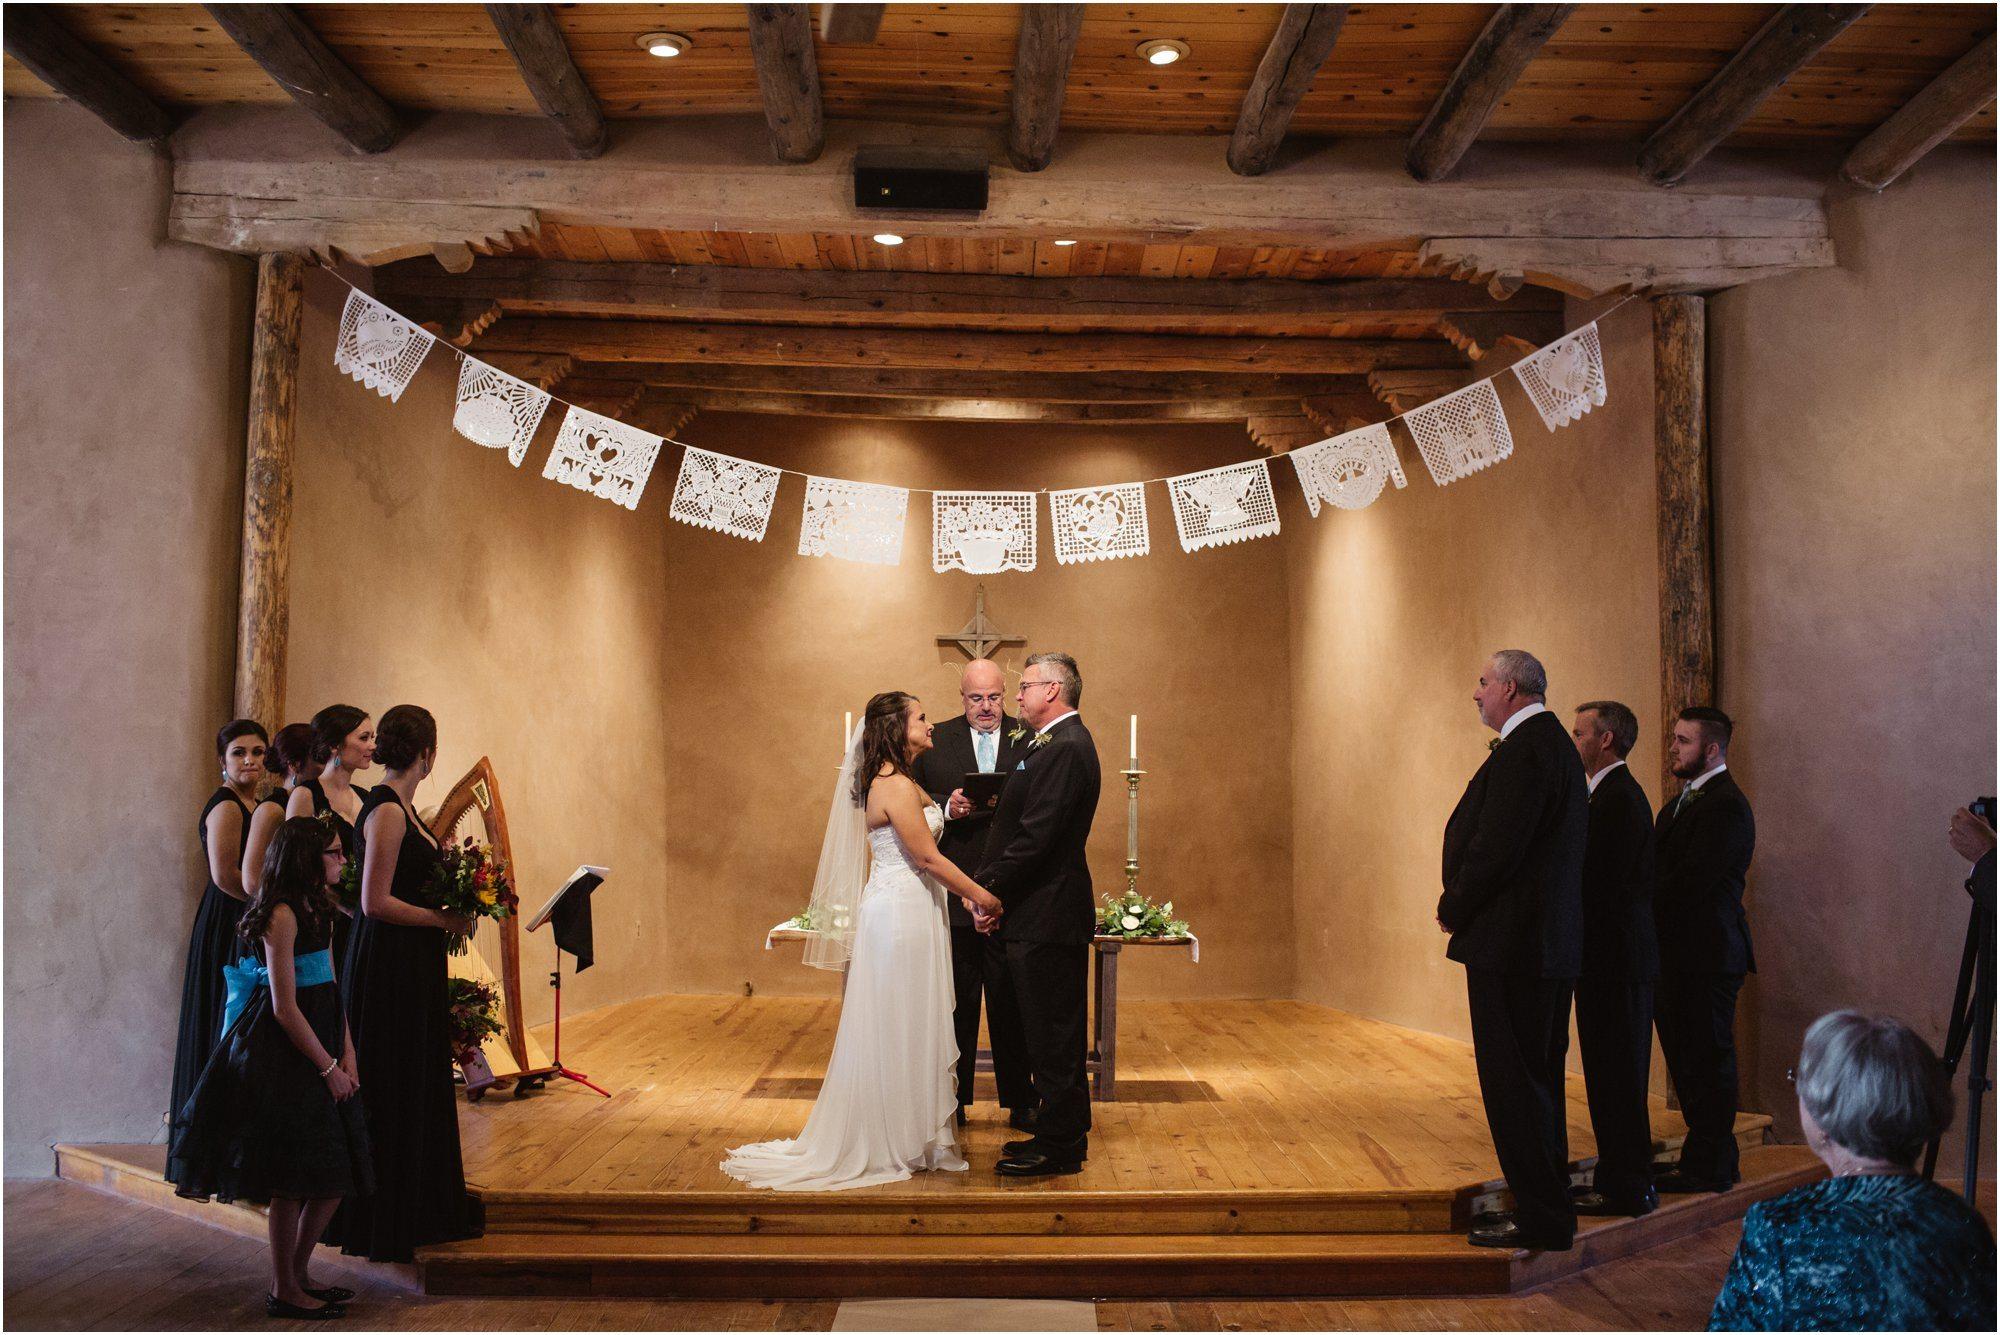 047BlueRosePhotography_ Albuquerque wedding photographers